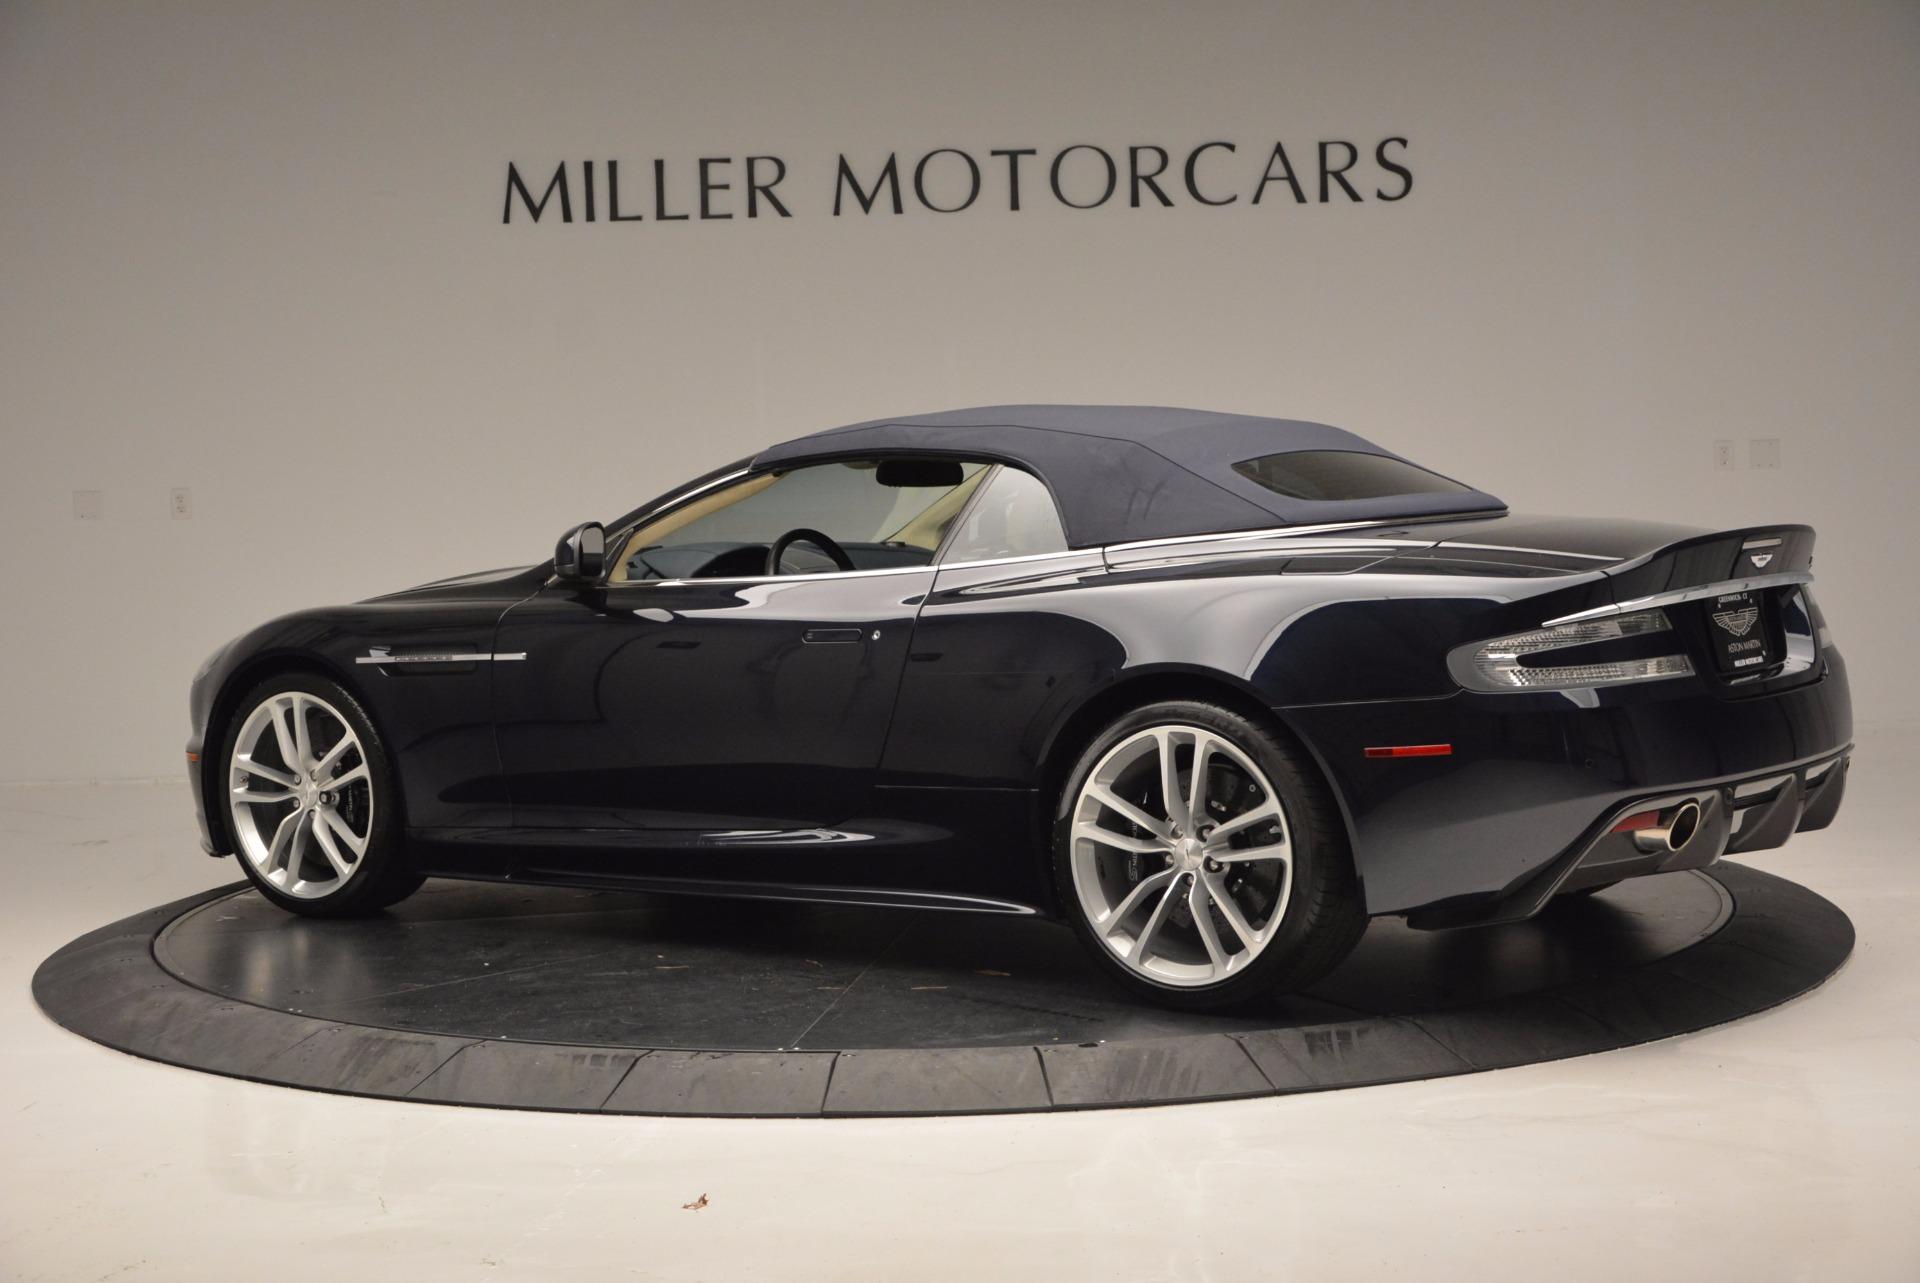 Used 2012 Aston Martin DBS Volante For Sale In Greenwich, CT 644_p16